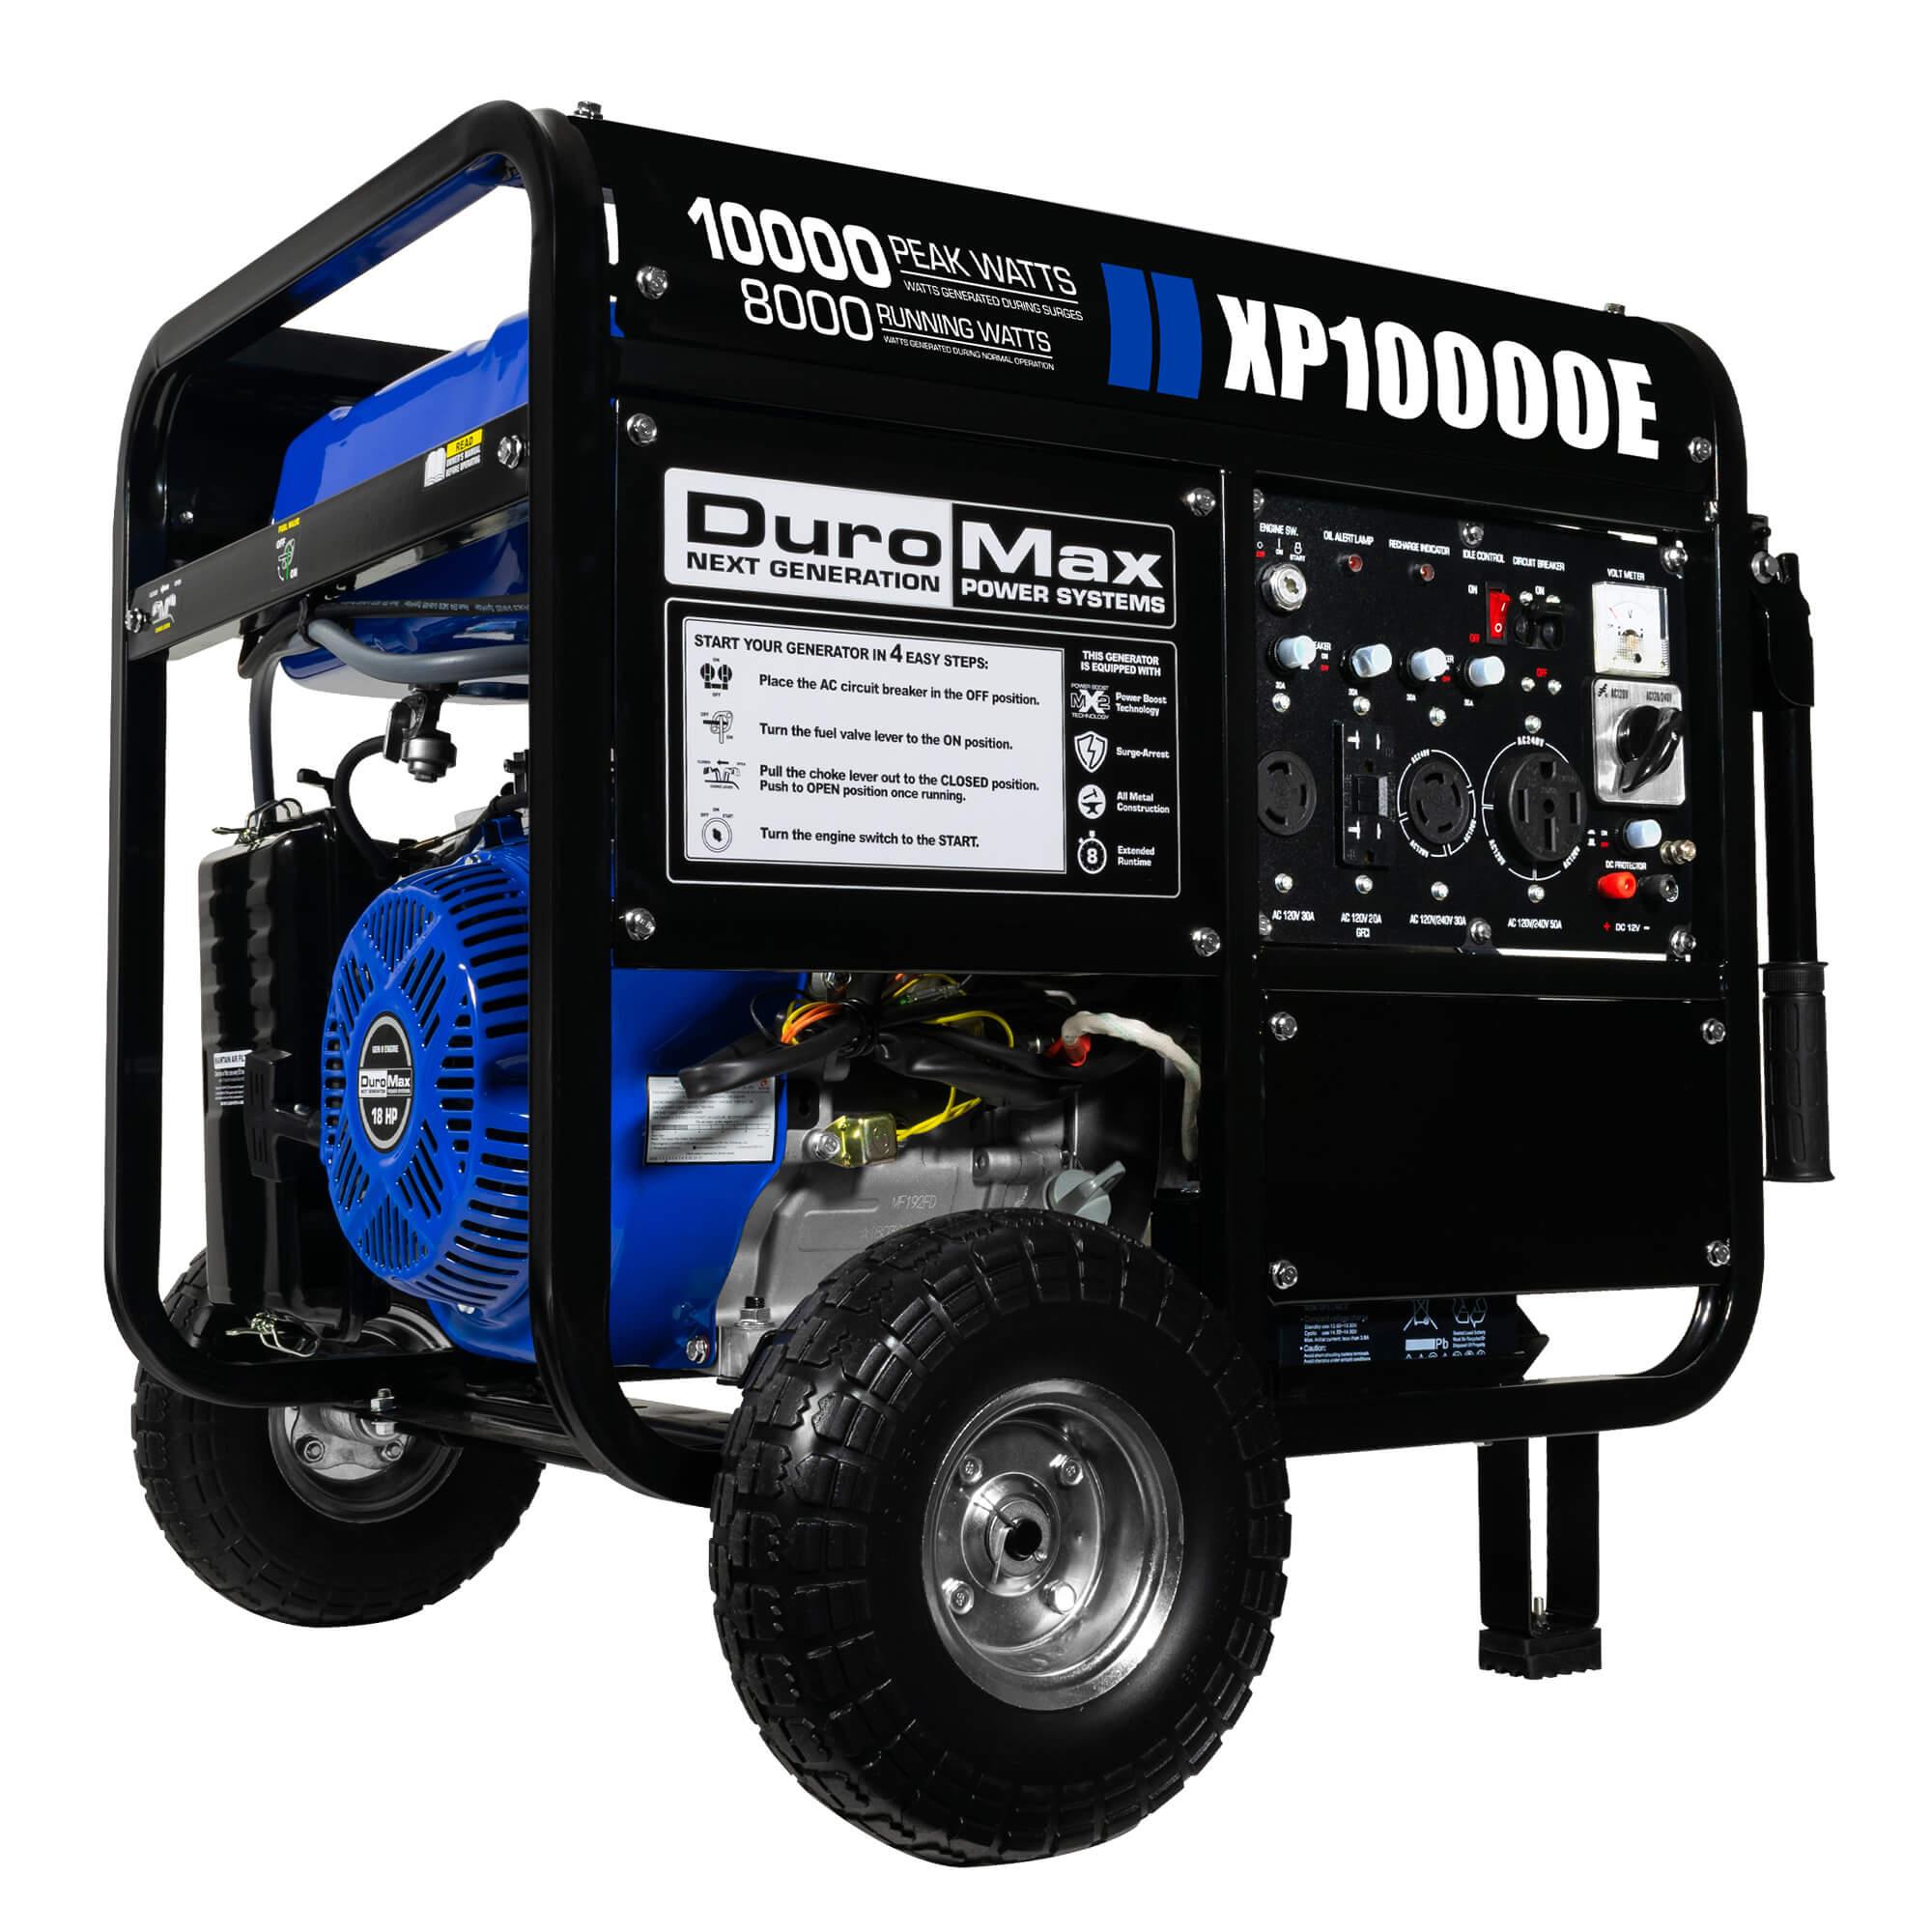 Duromax 10000 Watt 18hp Portable Gas Electric Start Generator Rv Trailer Coupler Parts Diagram Http Wwwebaycom Itm Freedompivot Home Standby